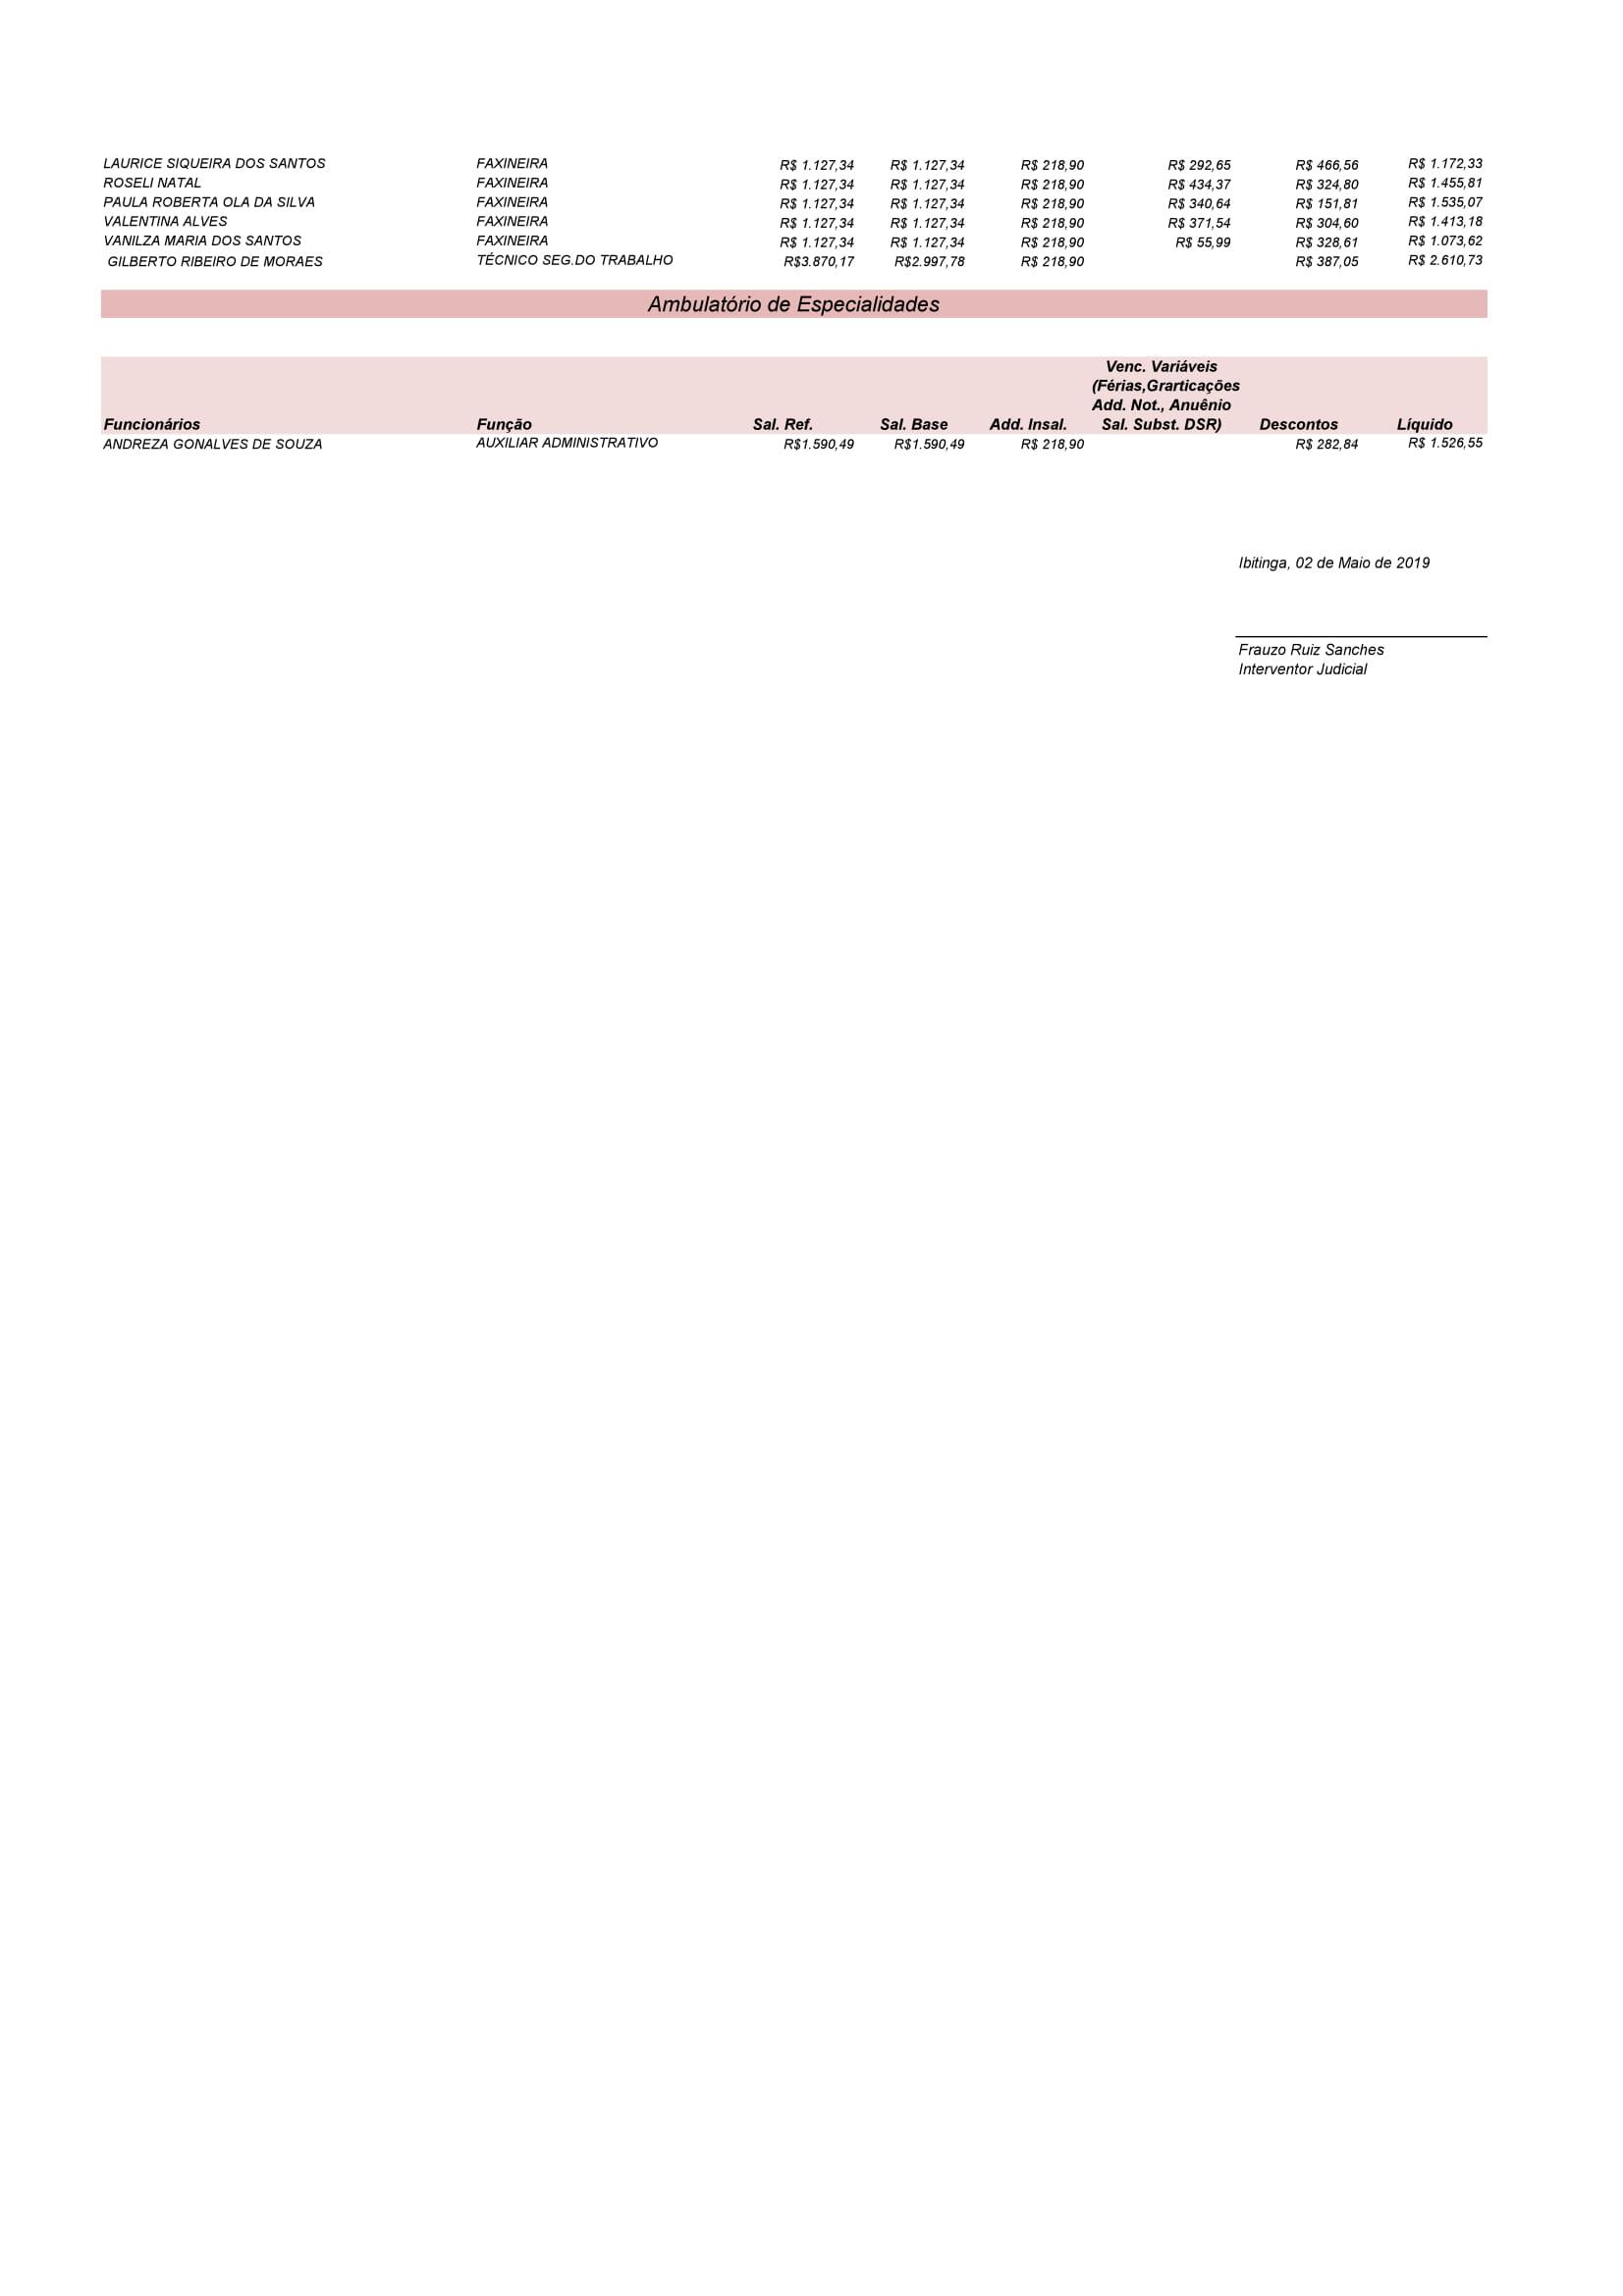 TRANSPARENCIA 04-012019-4